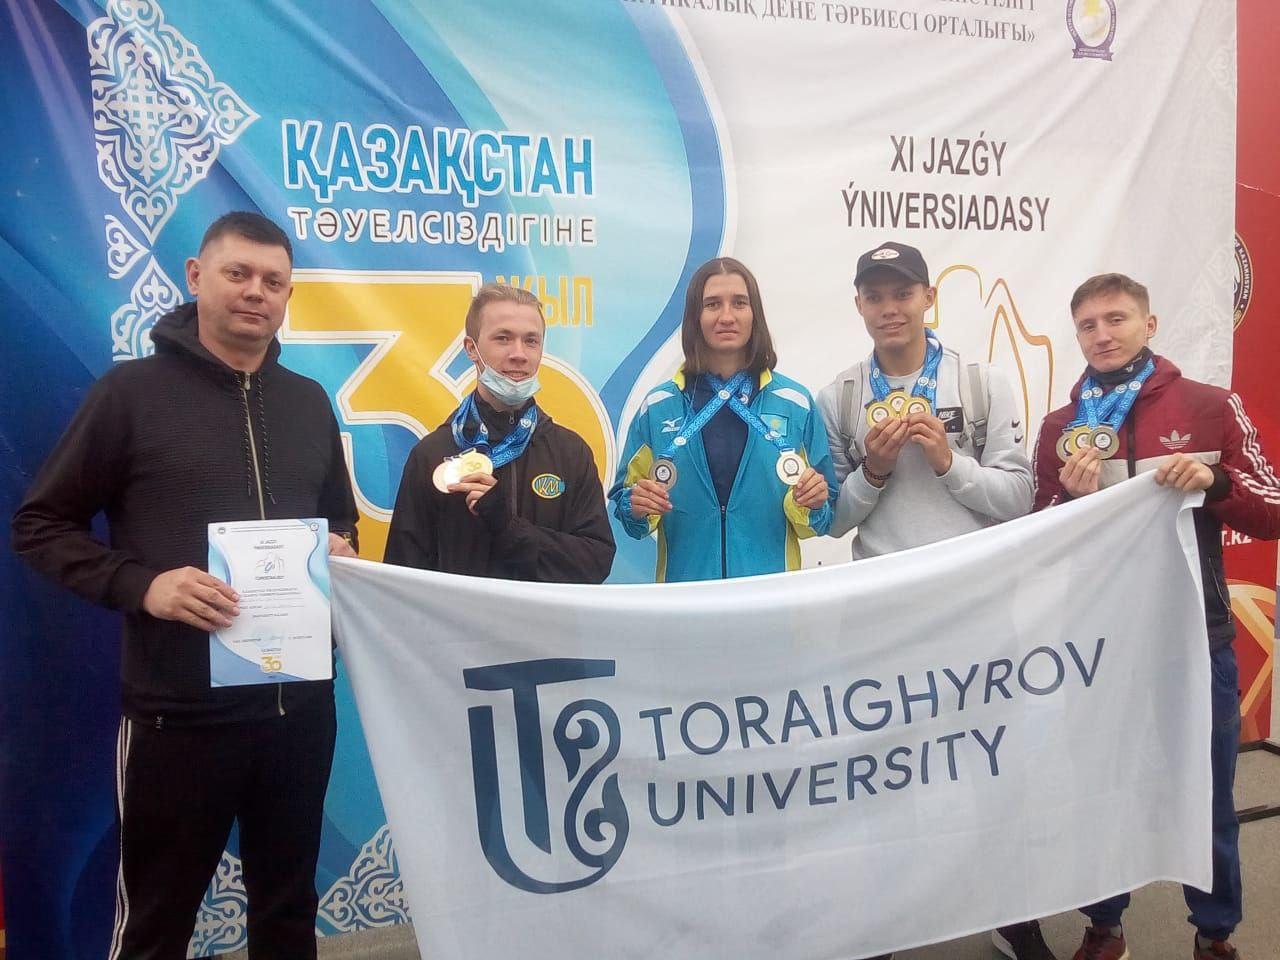 gxvl2nmh8kejpg.jpeg Toraighyrov University